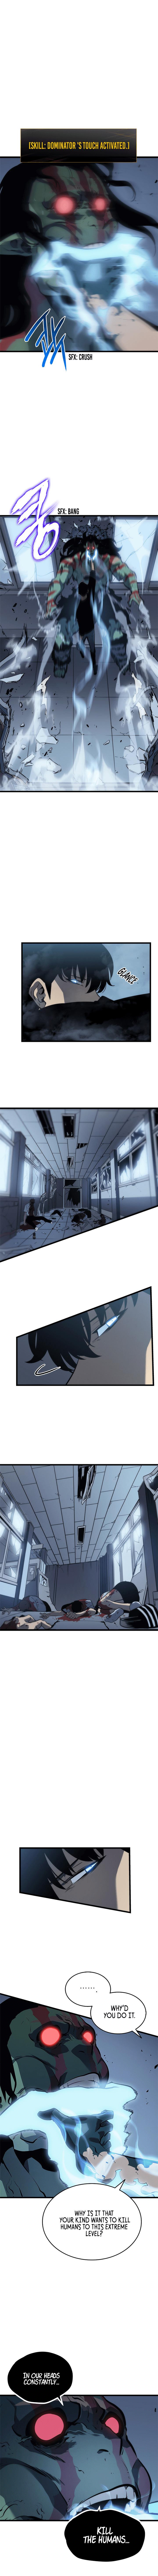 Manga Solo Leveling - Chapter 120 Page 7